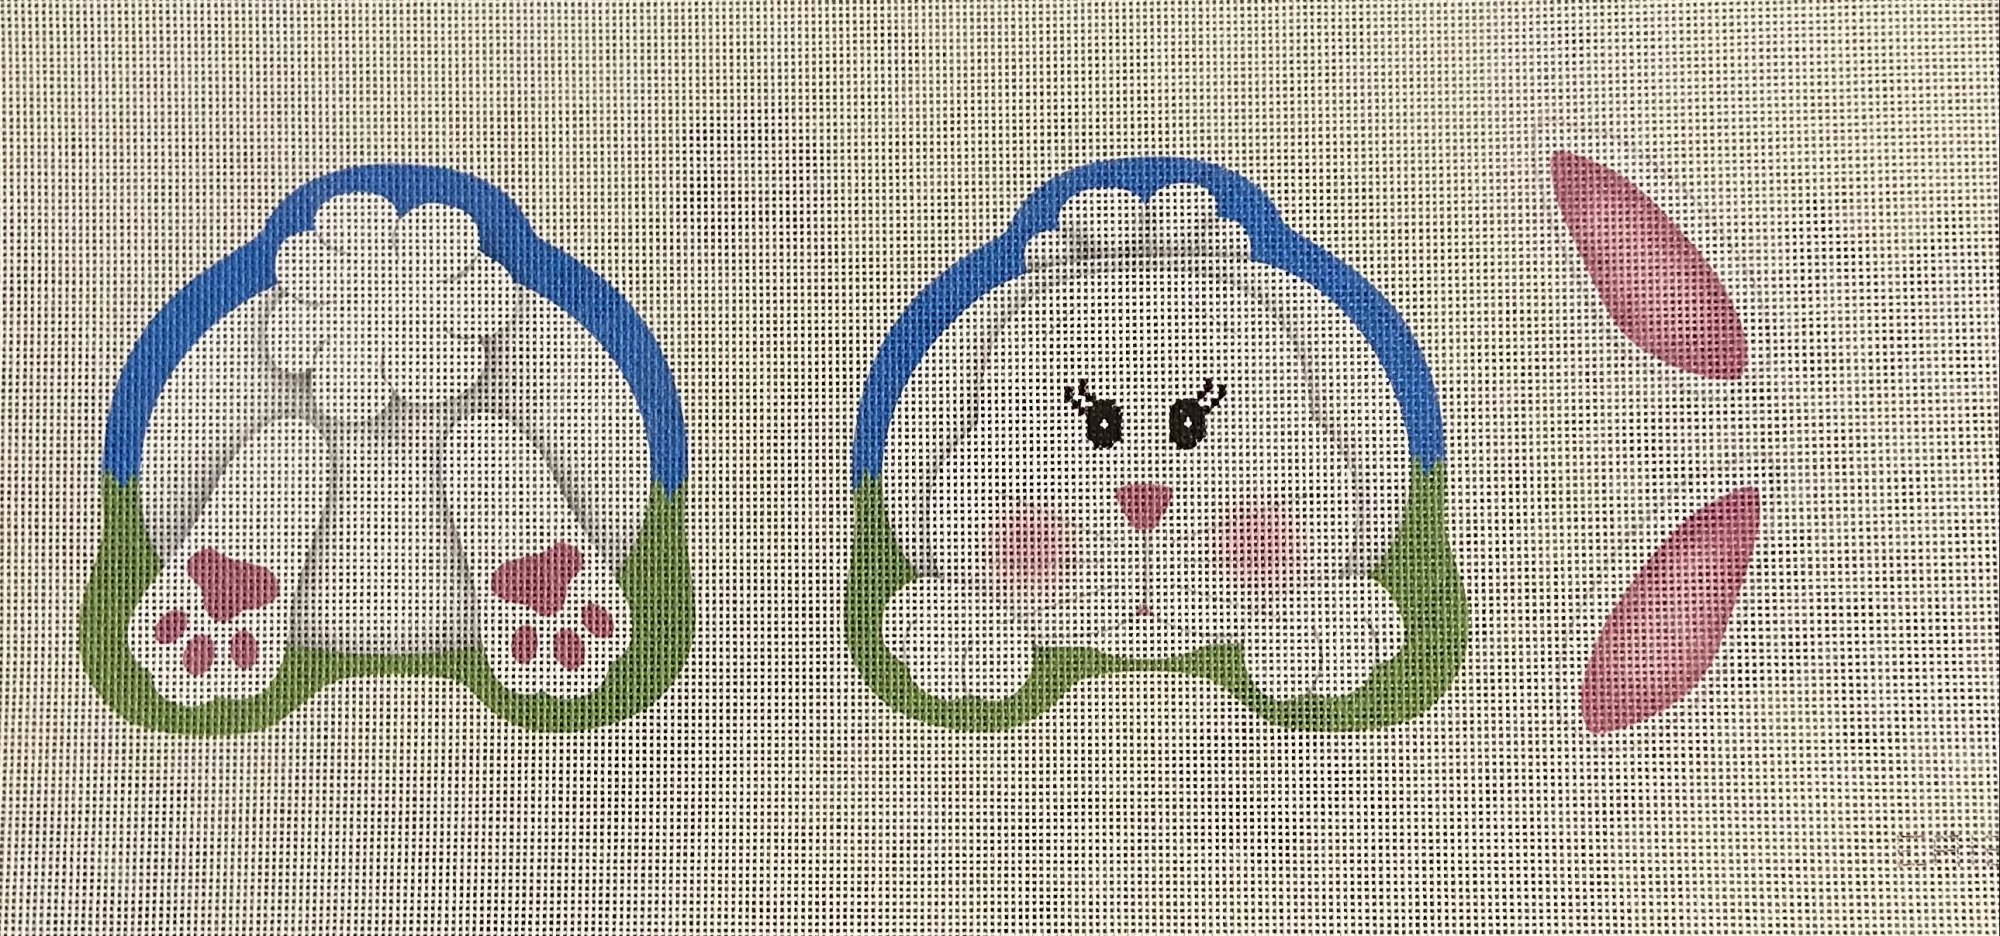 2 Sided Bunny